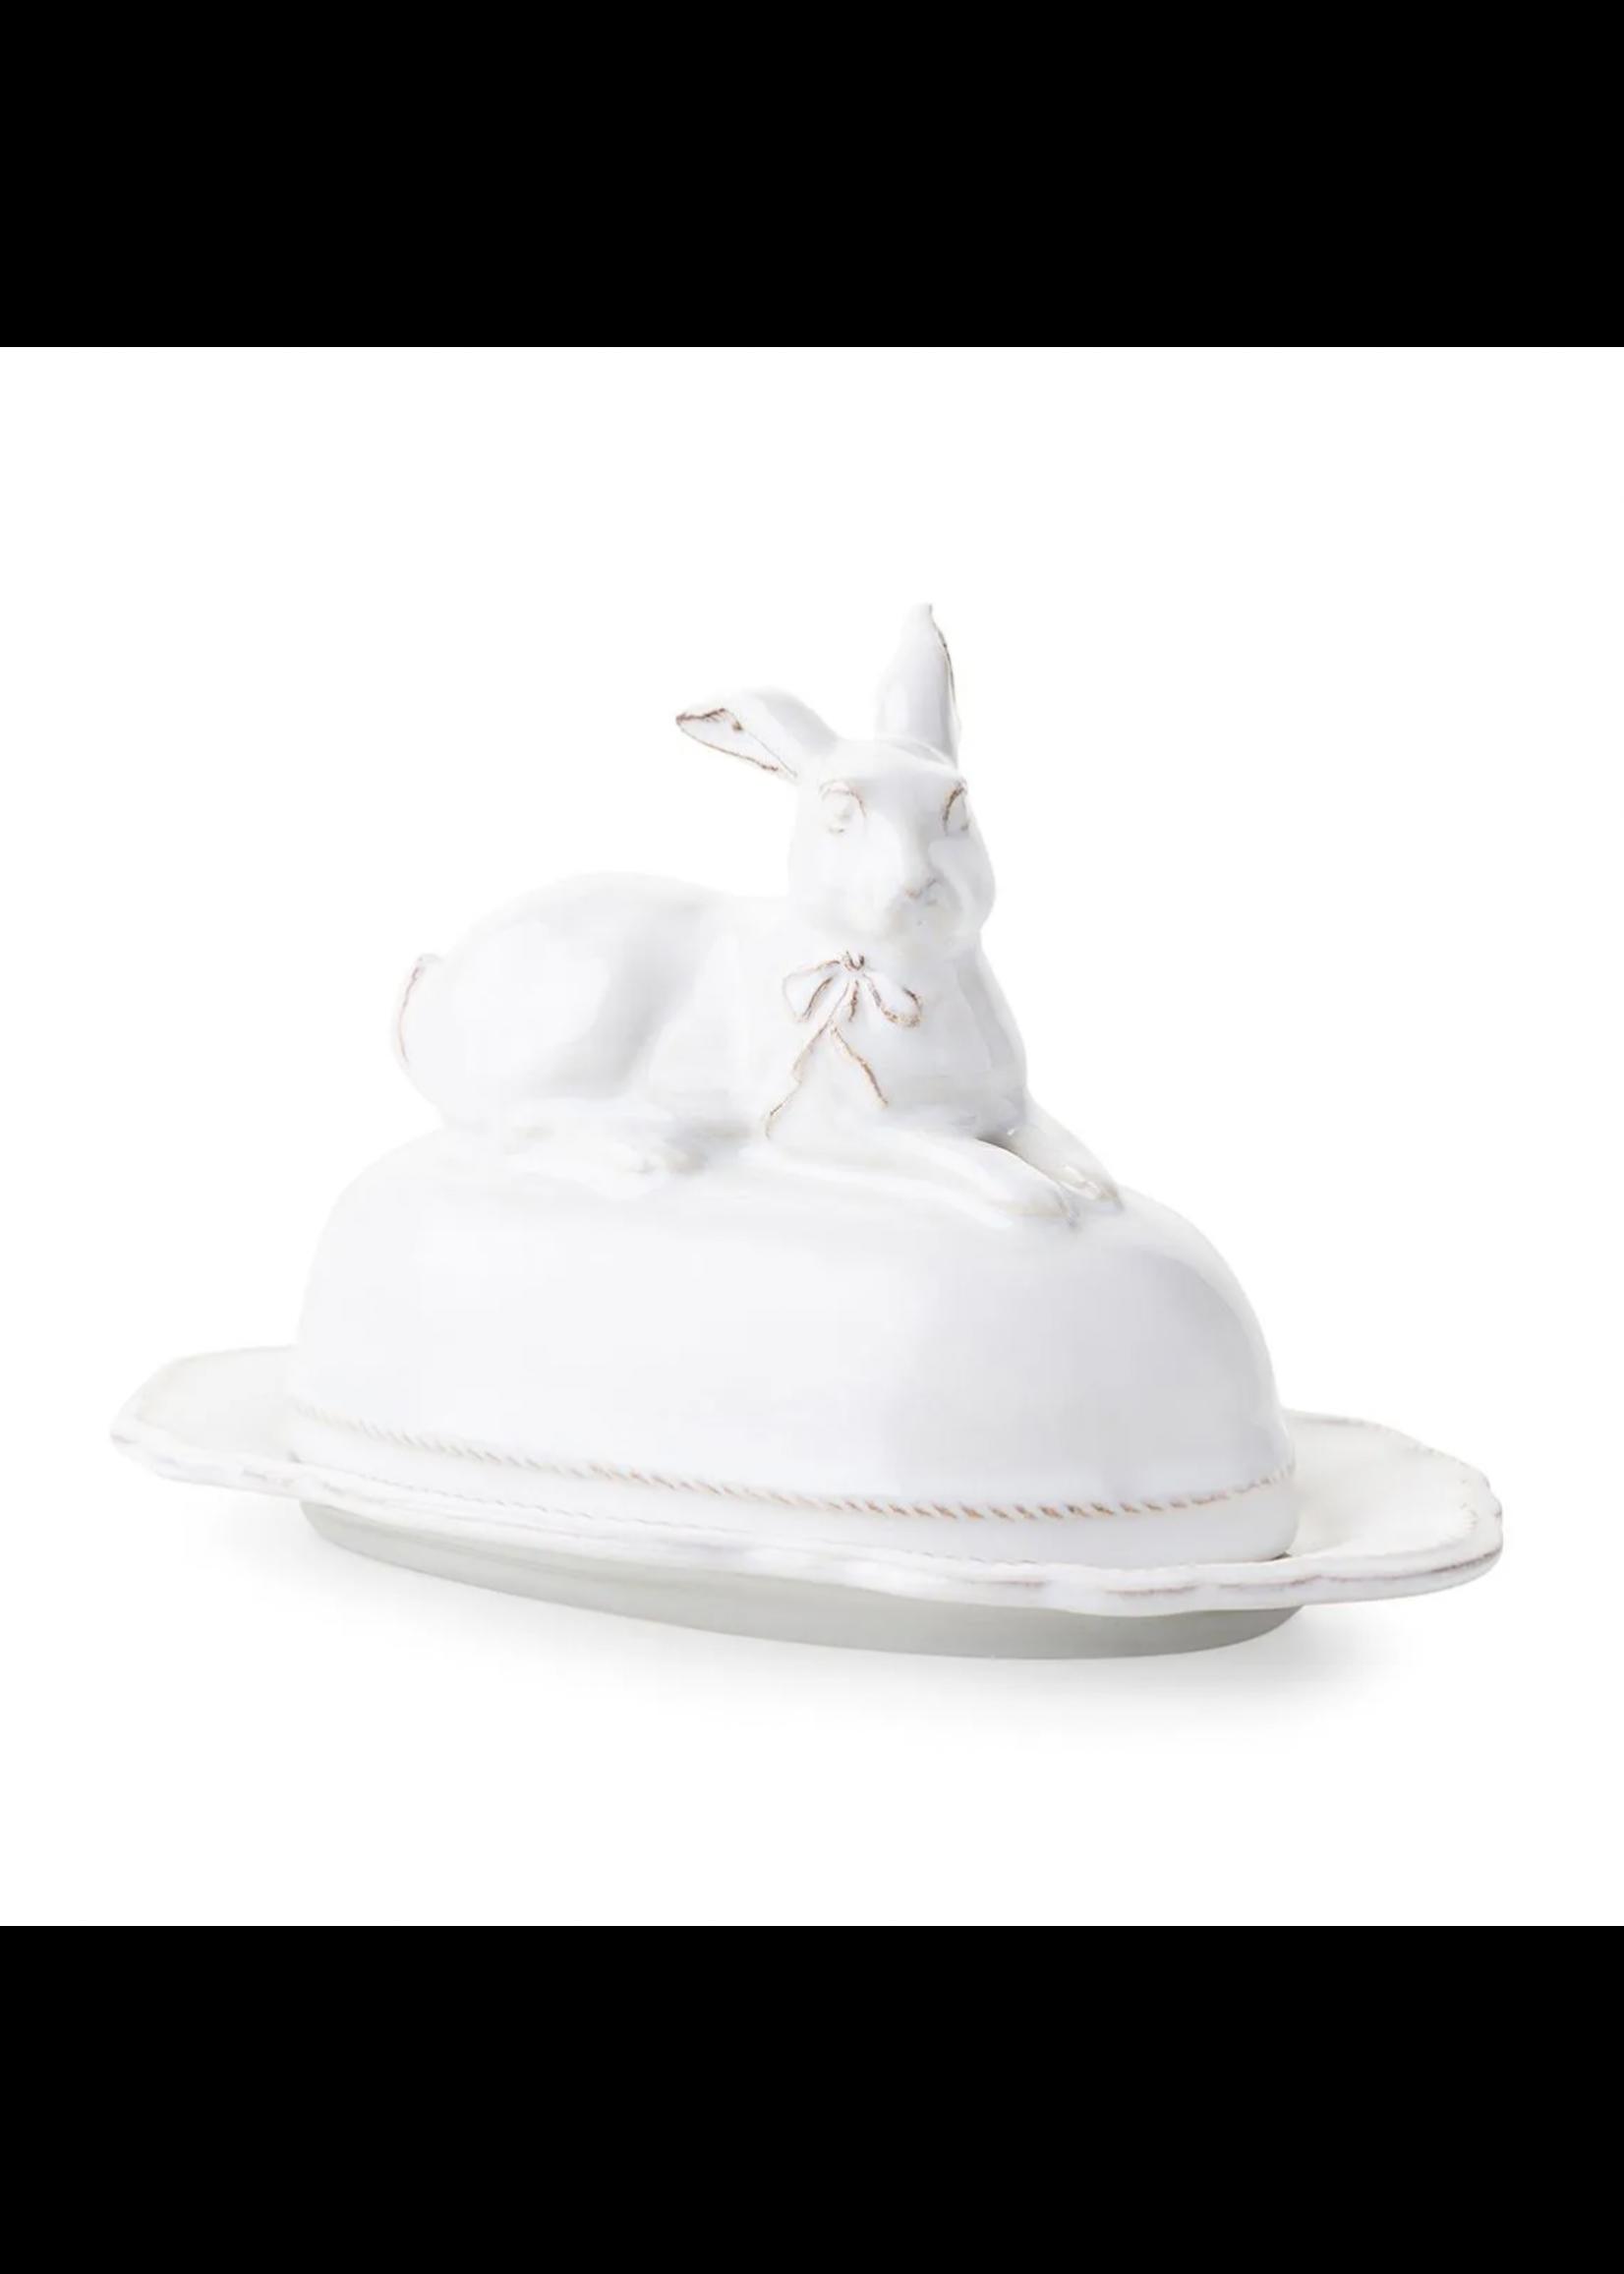 Juliska Butter Dish - Bridget Bunny